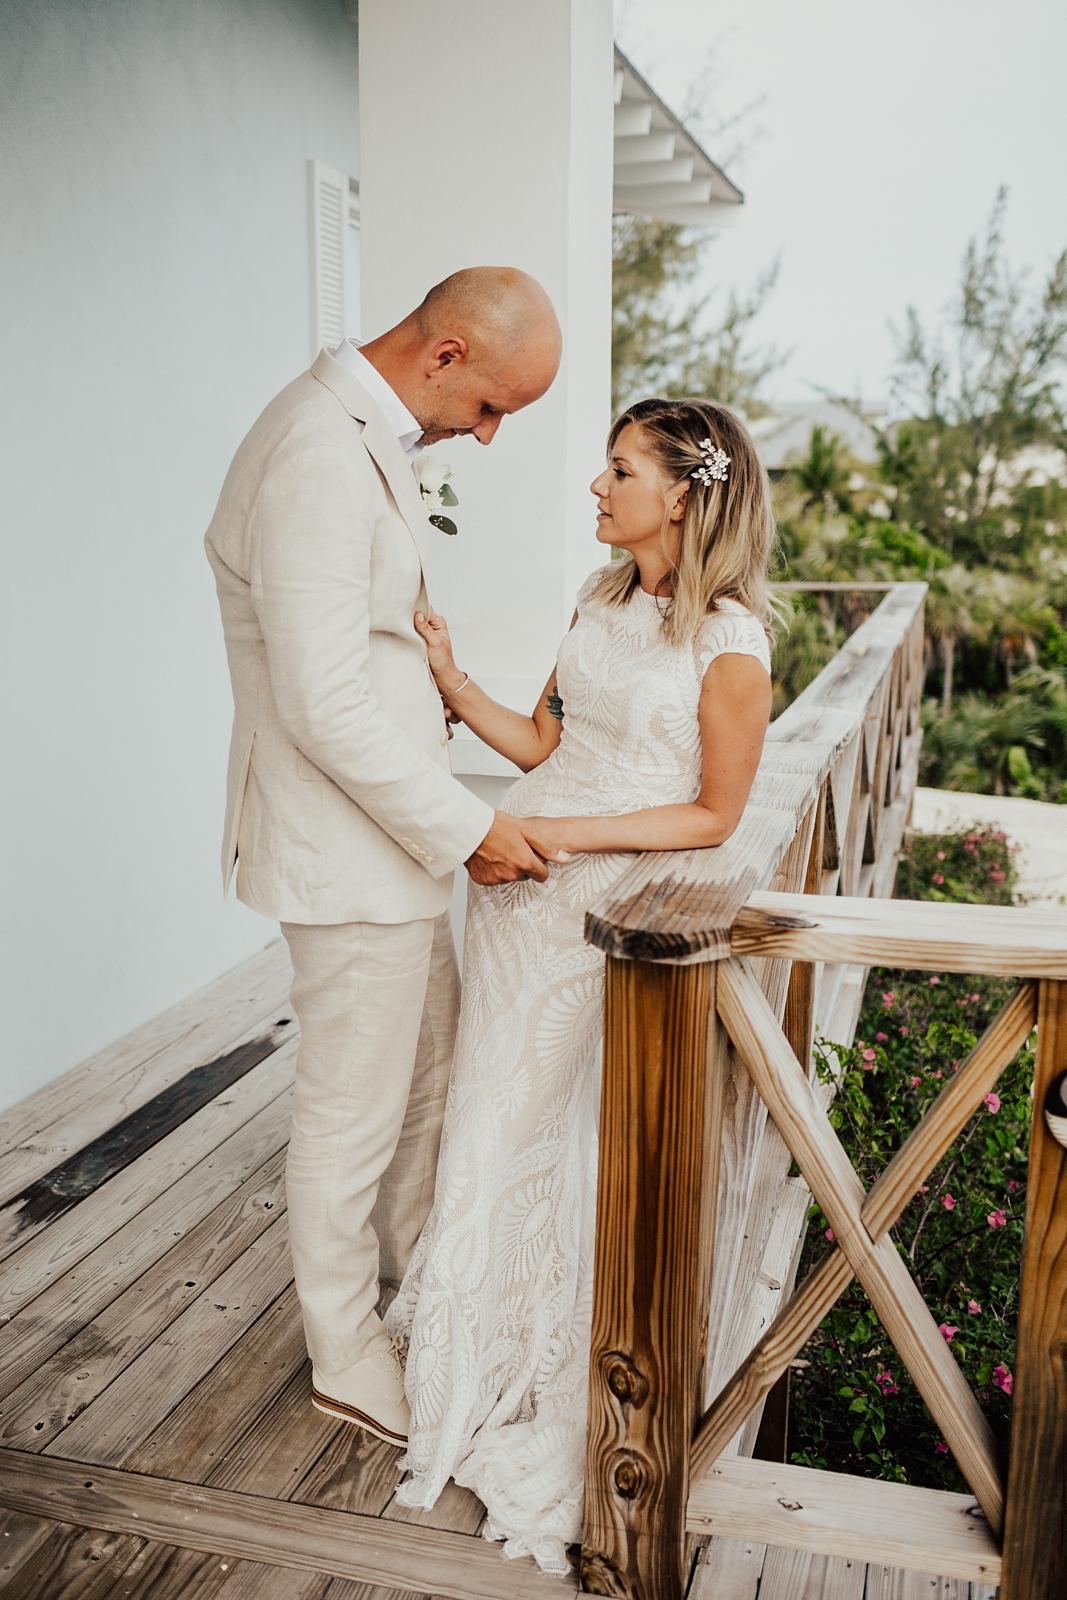 Jenni & Andrew Intimate Beach Destination Wedding in Little Exuma, Bahamas_0495.jpg